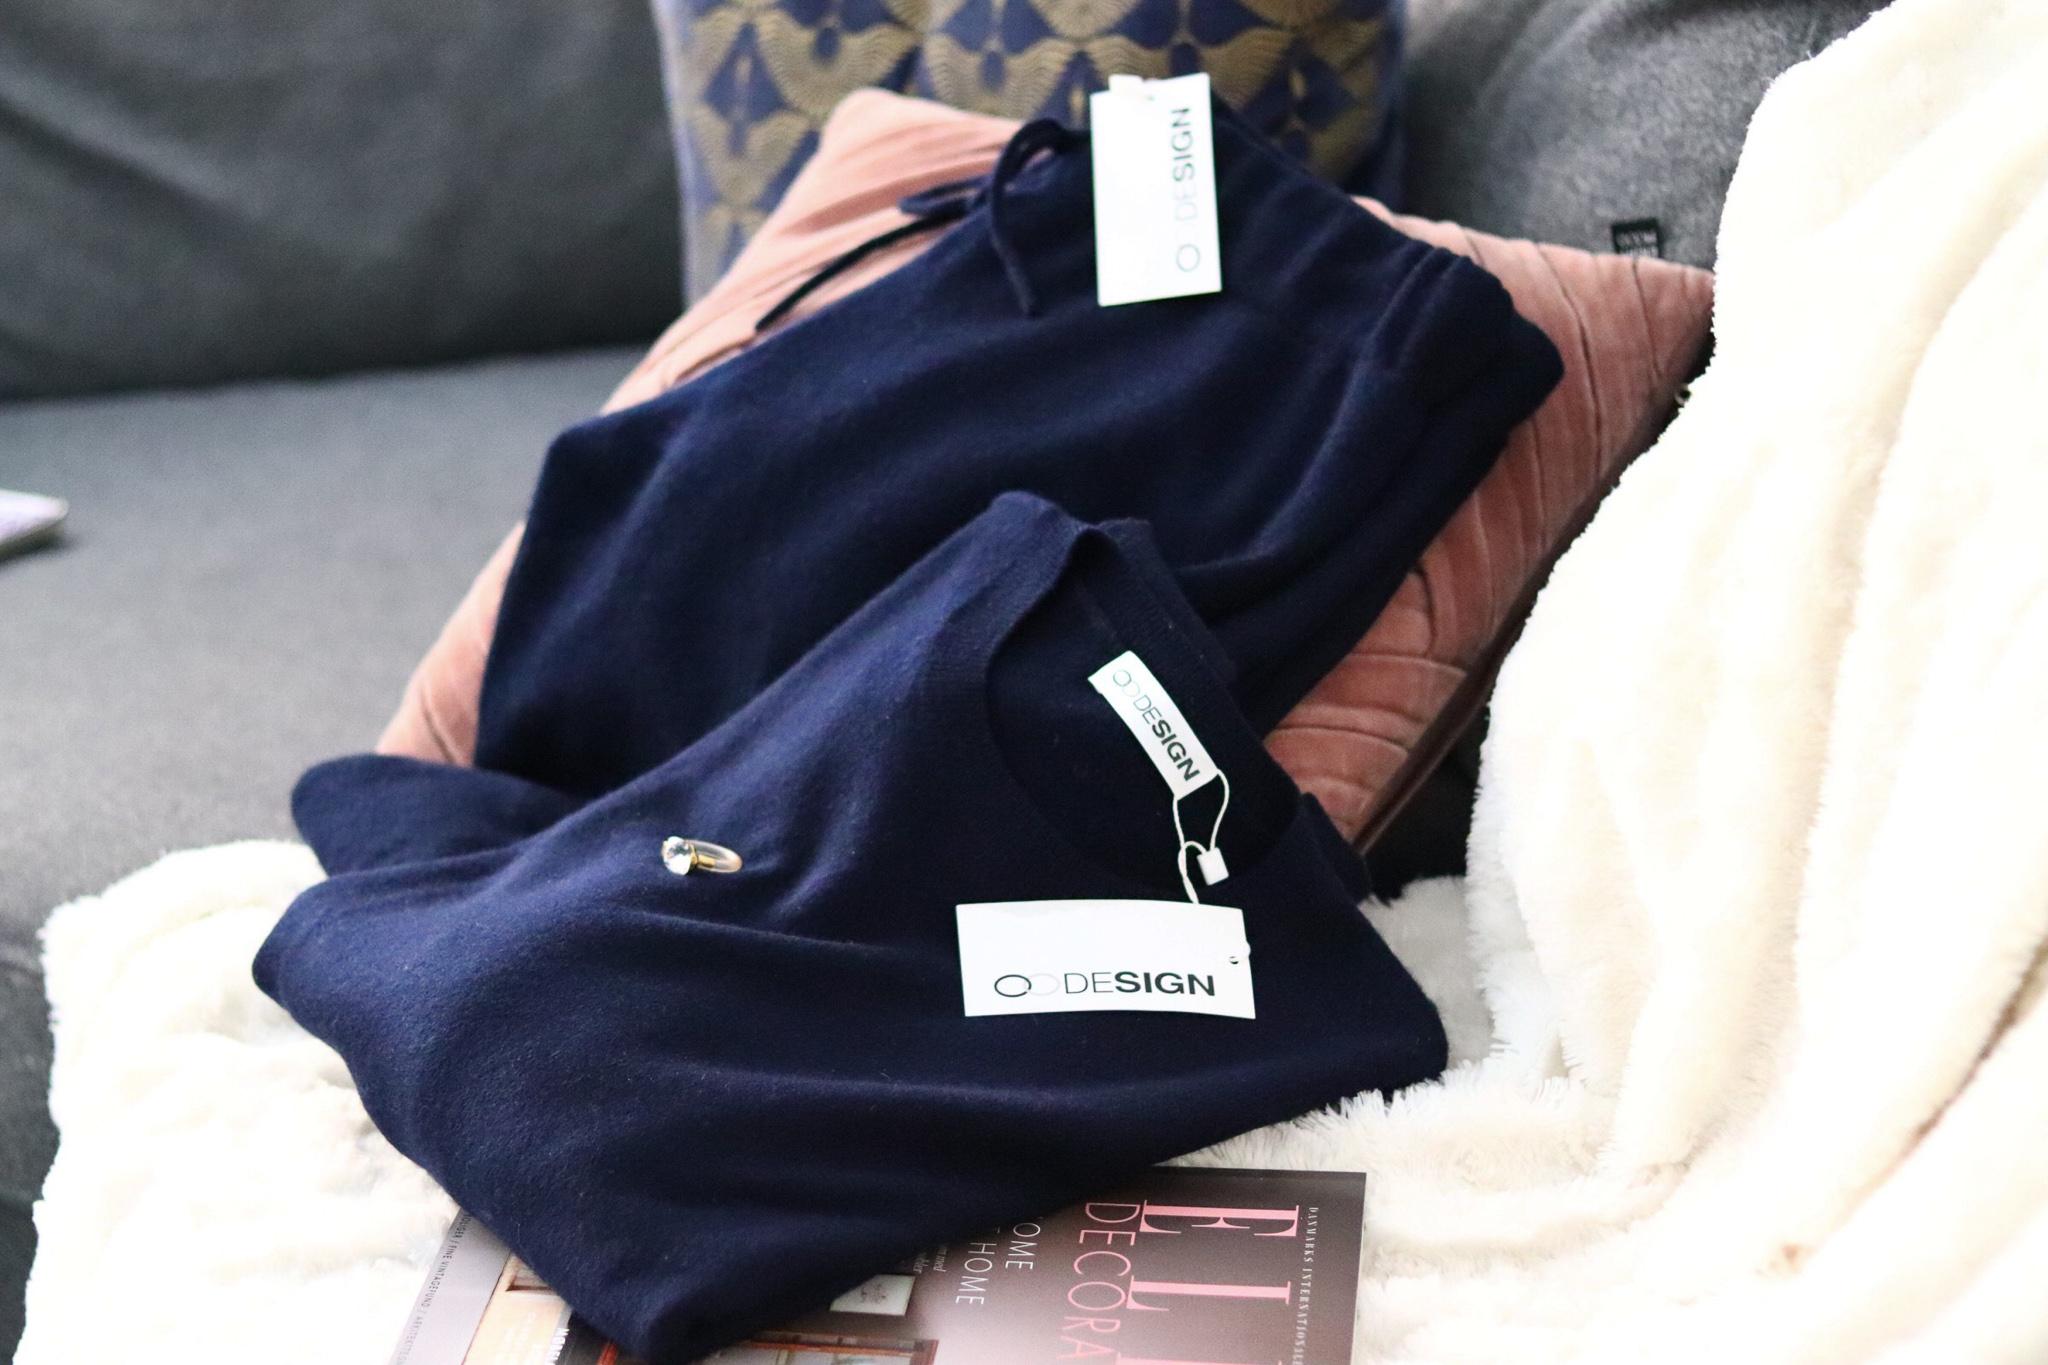 8Design kashmir mysdress snygga hemmaplagg loungewear cashmere